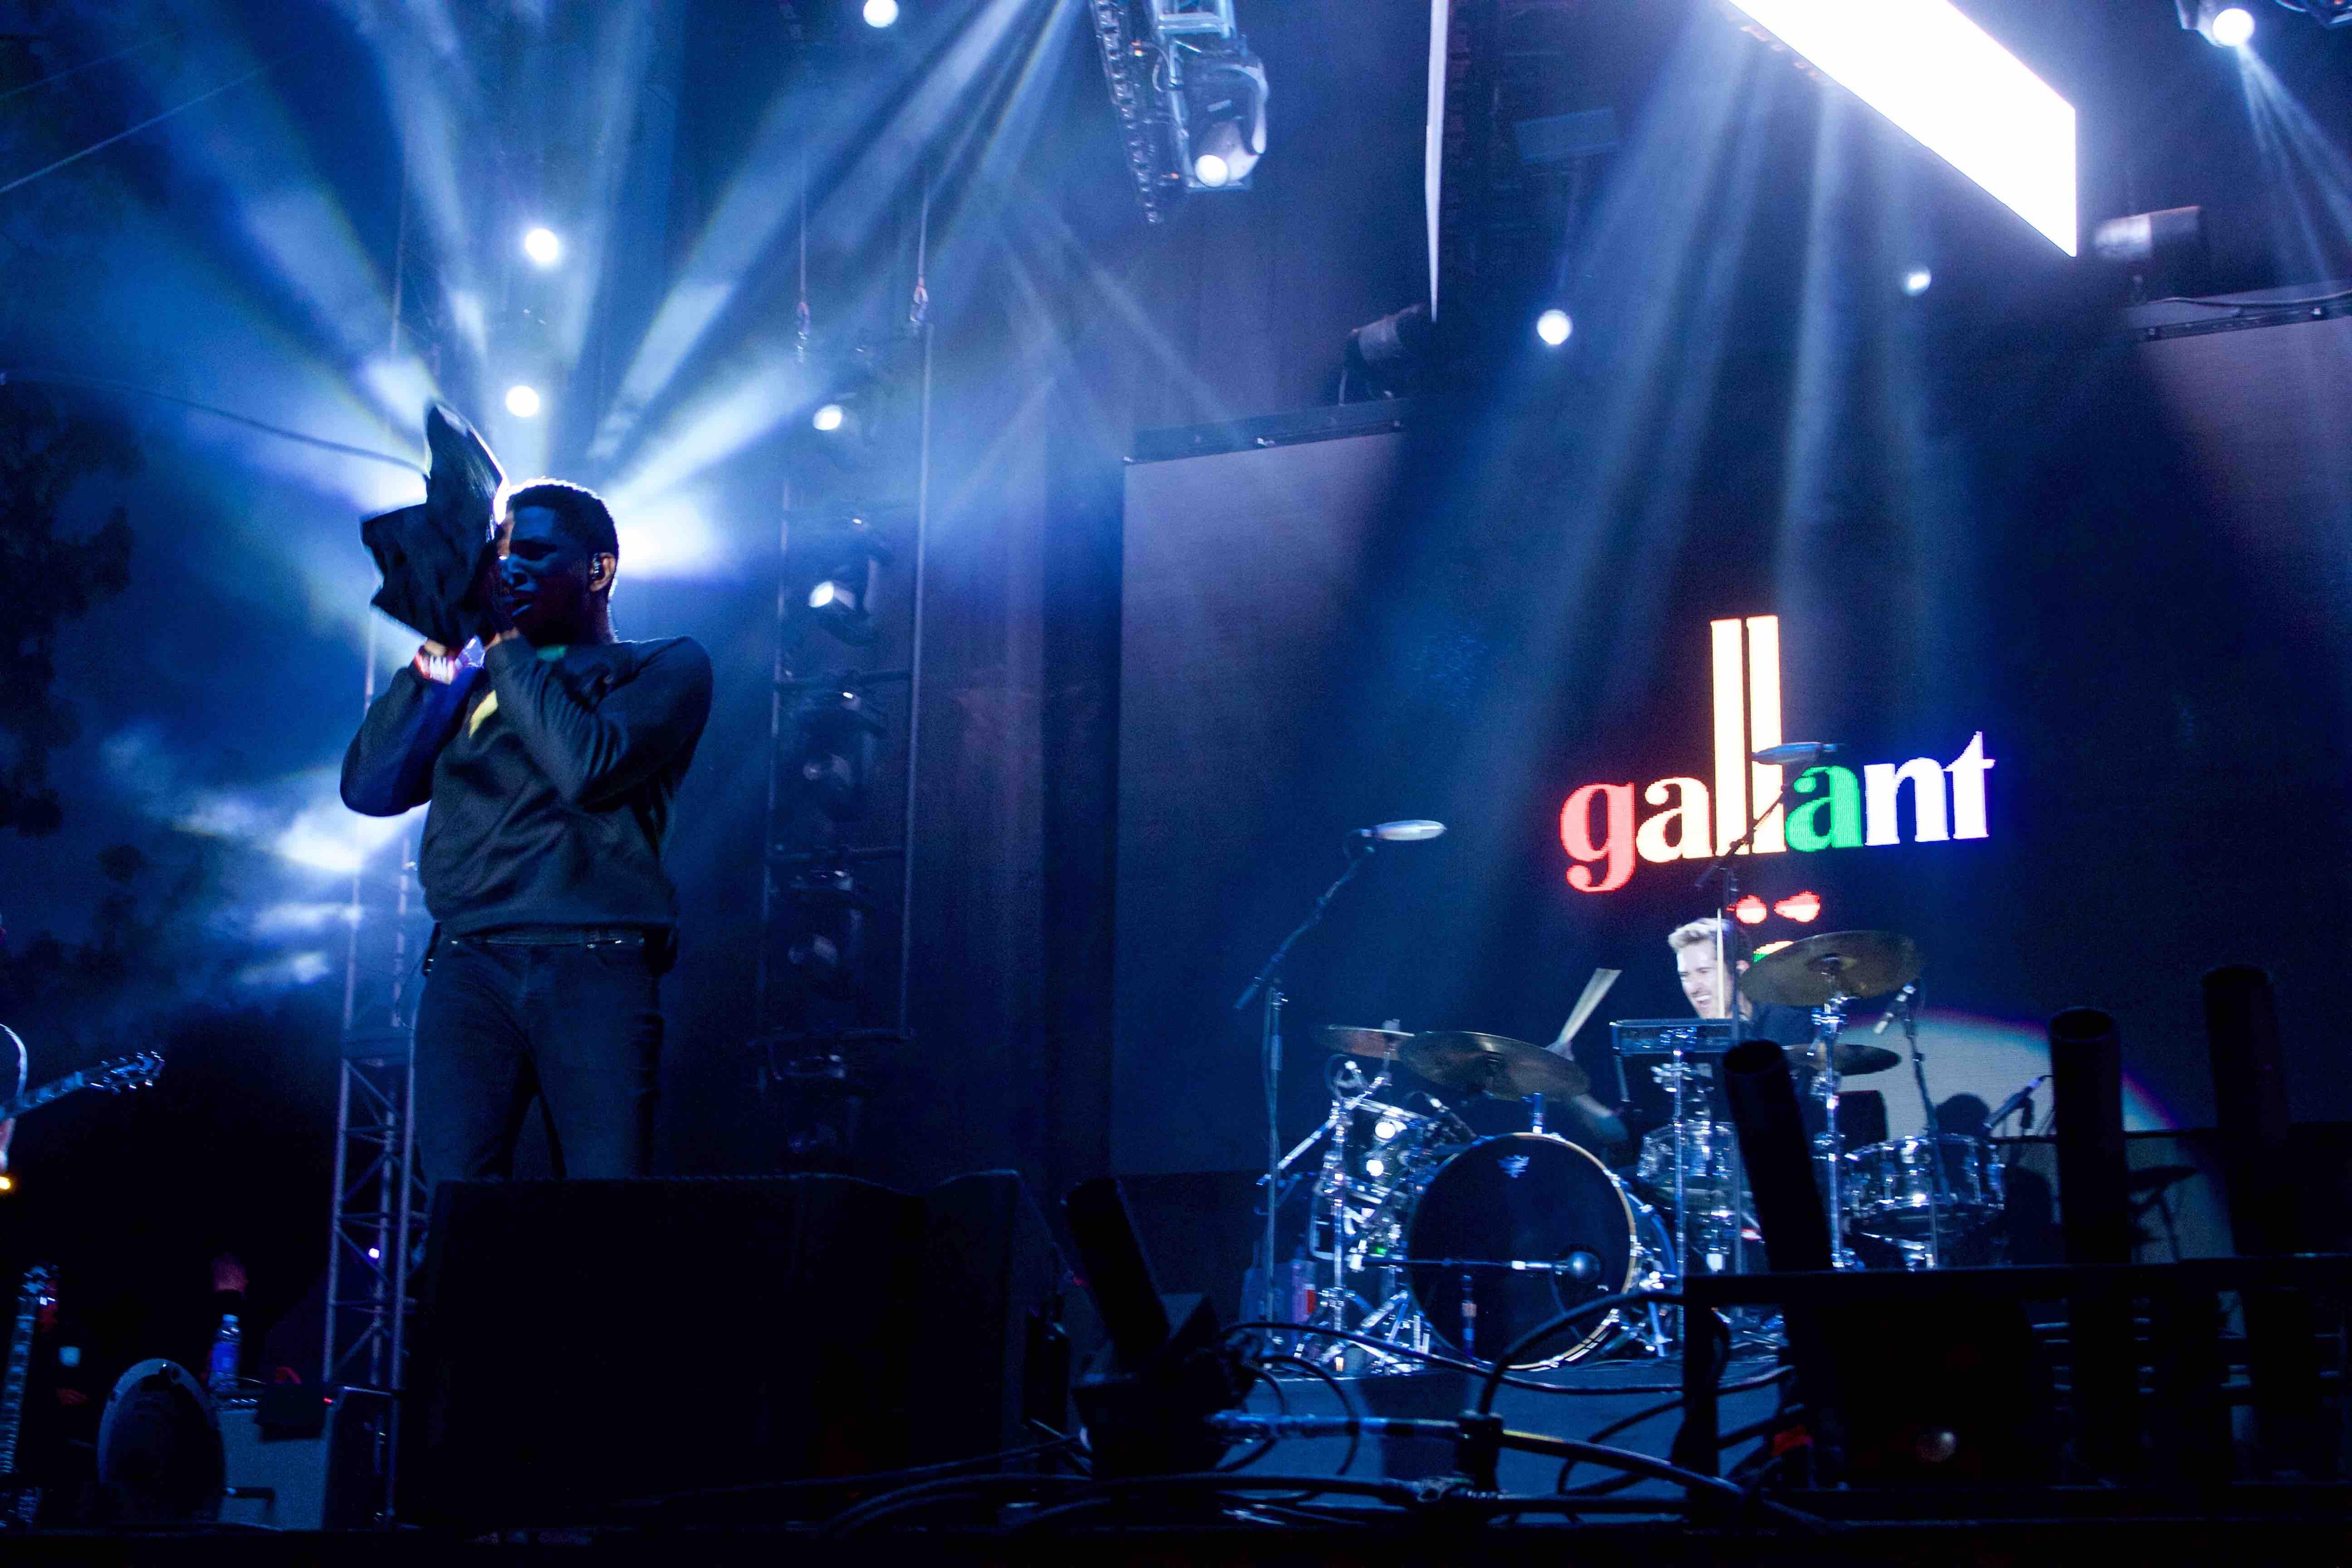 Gallant at L.A. PRIDE 6/12/16. Photo by Derrick K. Lee, Esq. (@Methodman13)